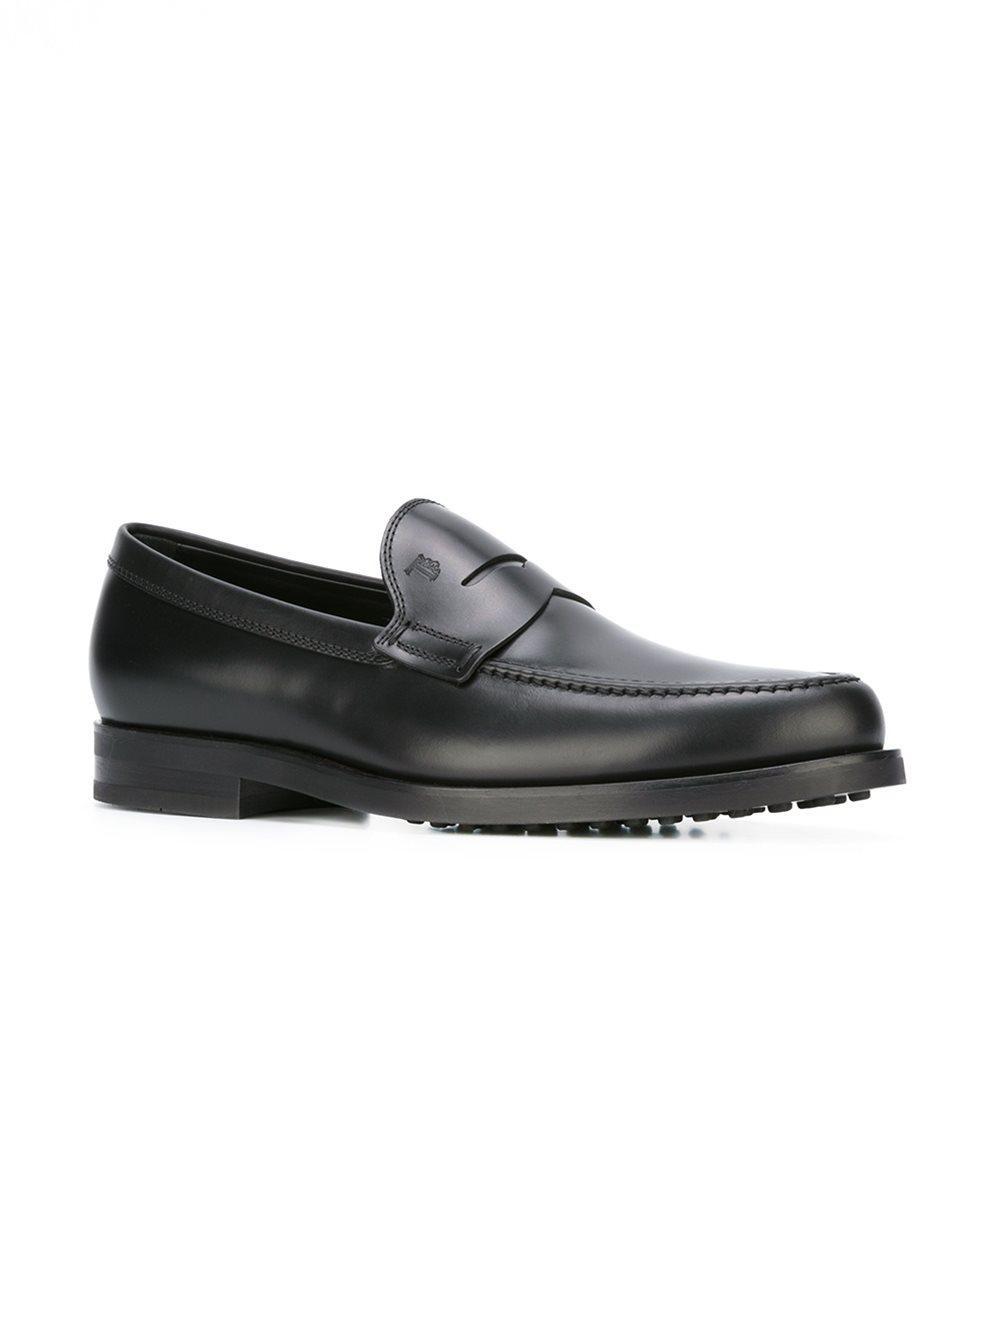 bc7e24e2adb Tod s - Black Classic Penny Loafers for Men - Lyst. View fullscreen